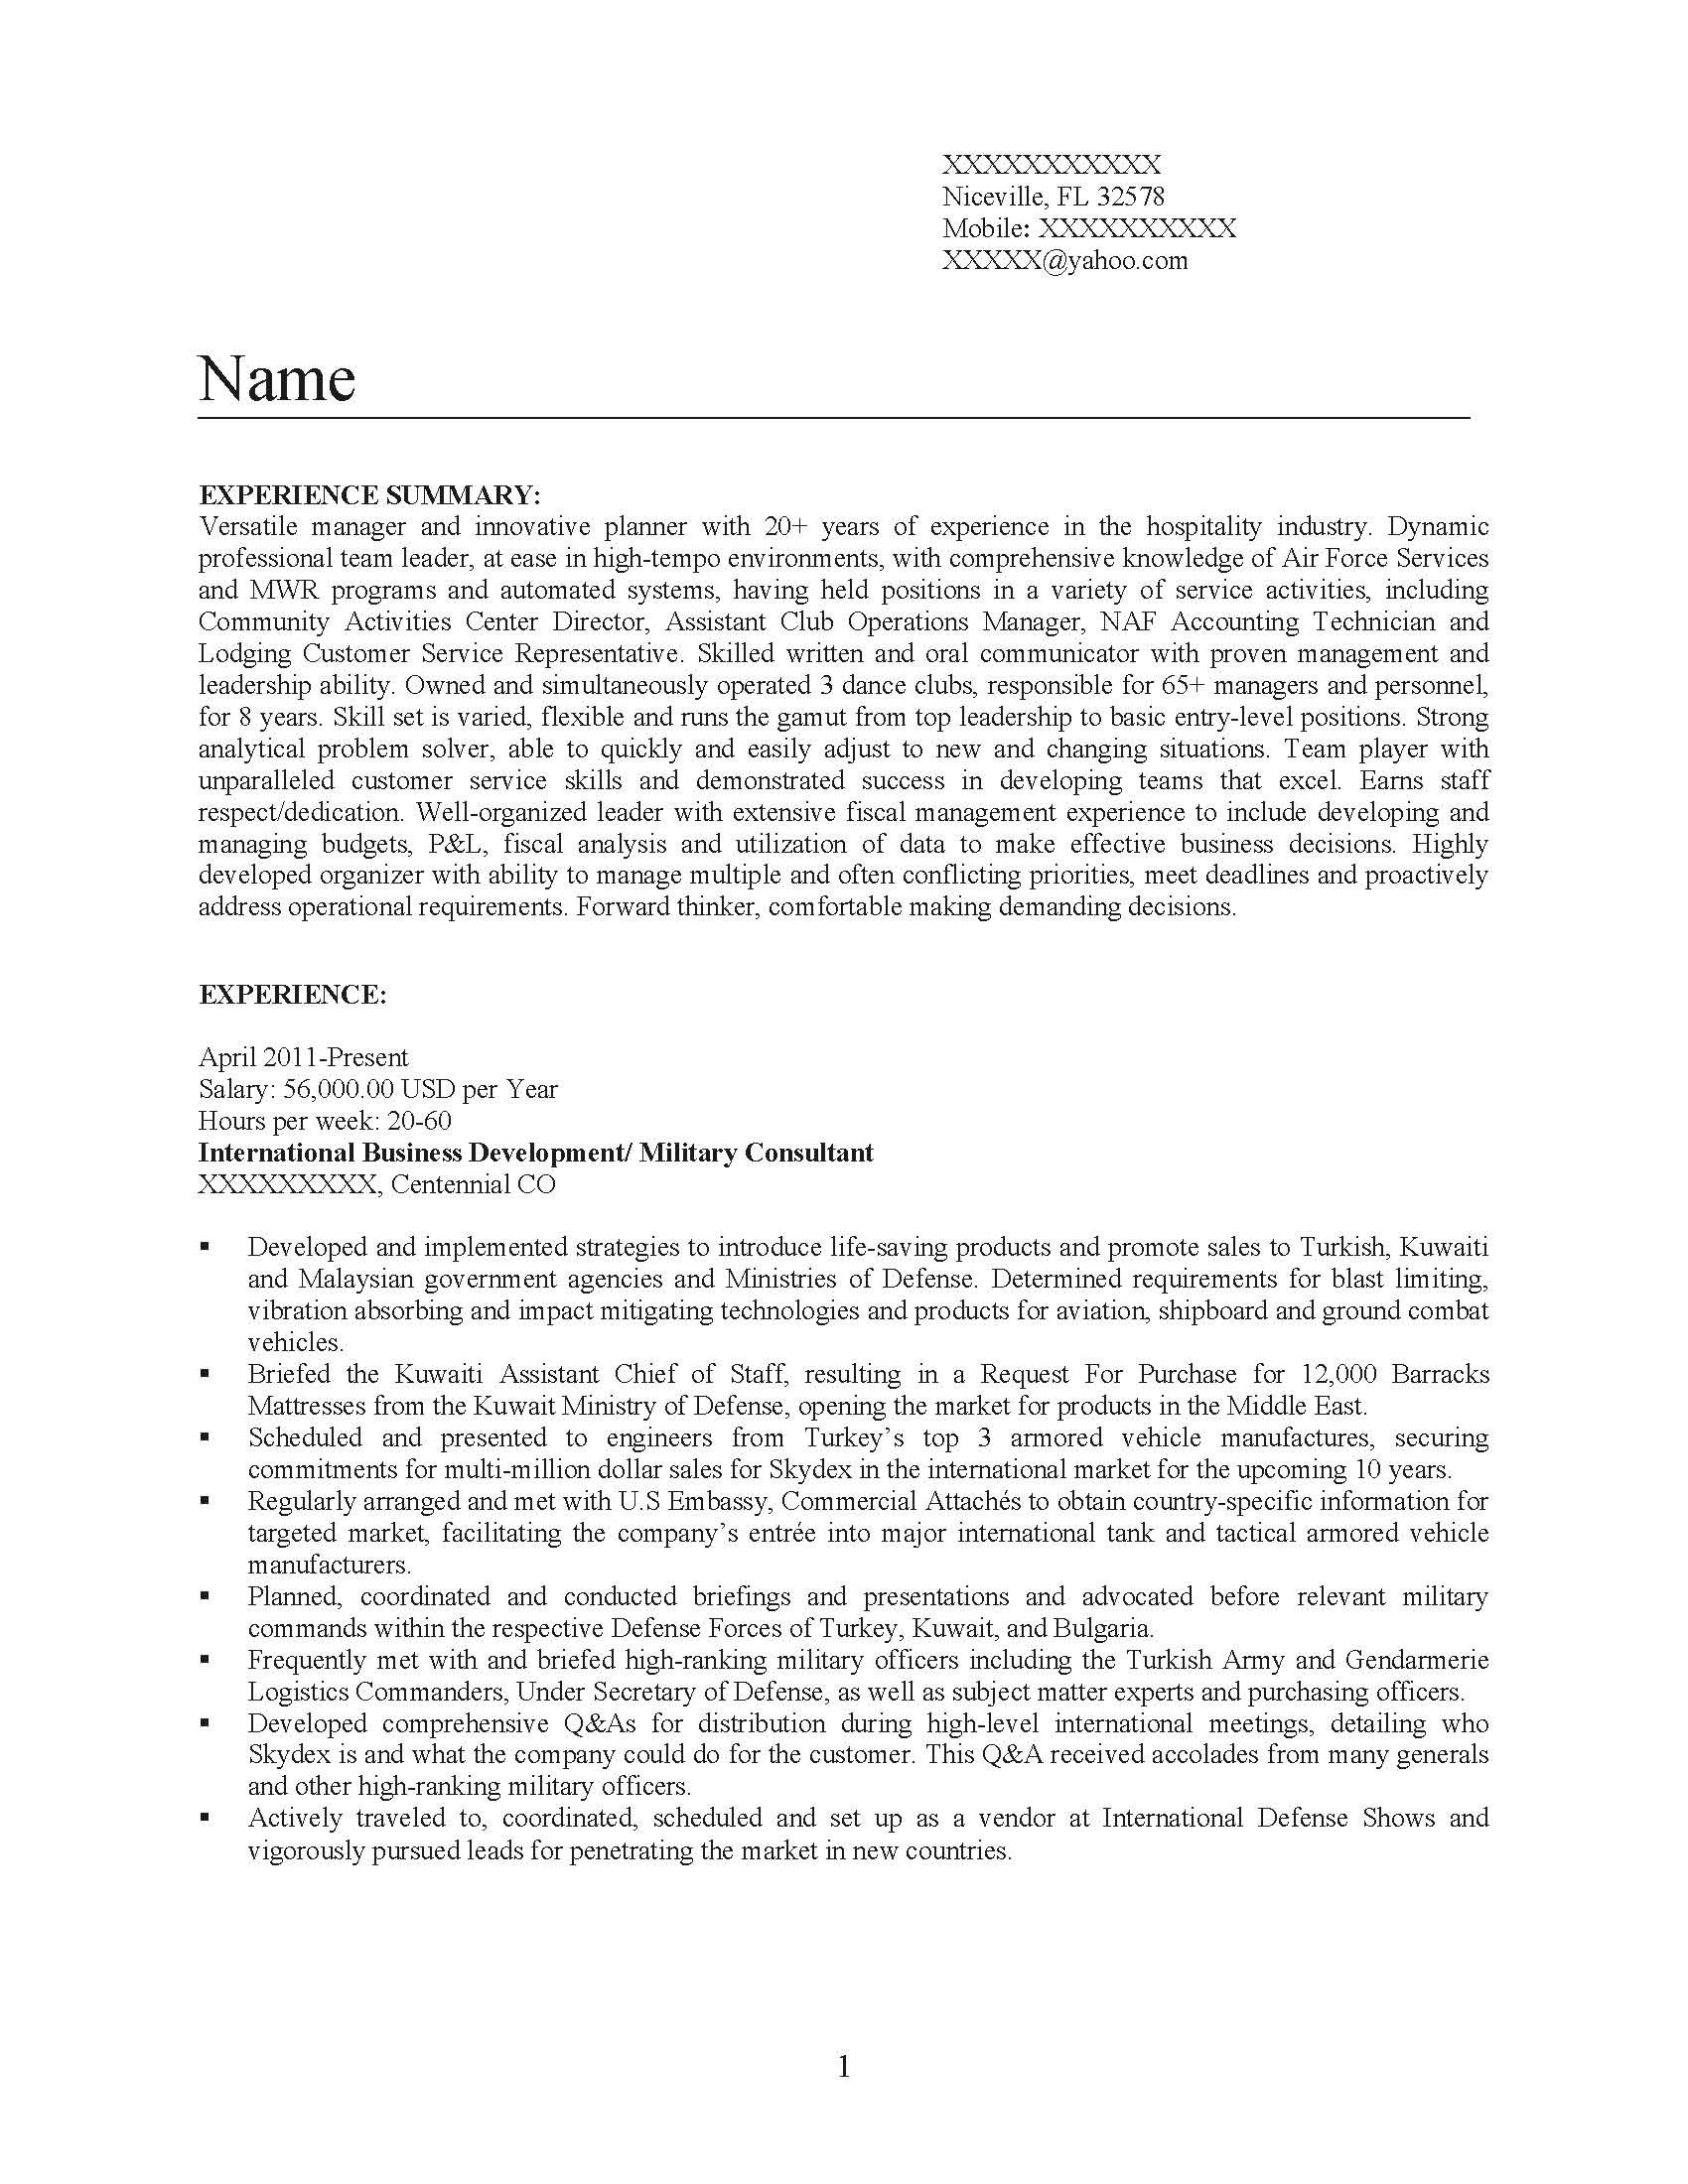 Senior Management Professional Resume Sample - Before-1